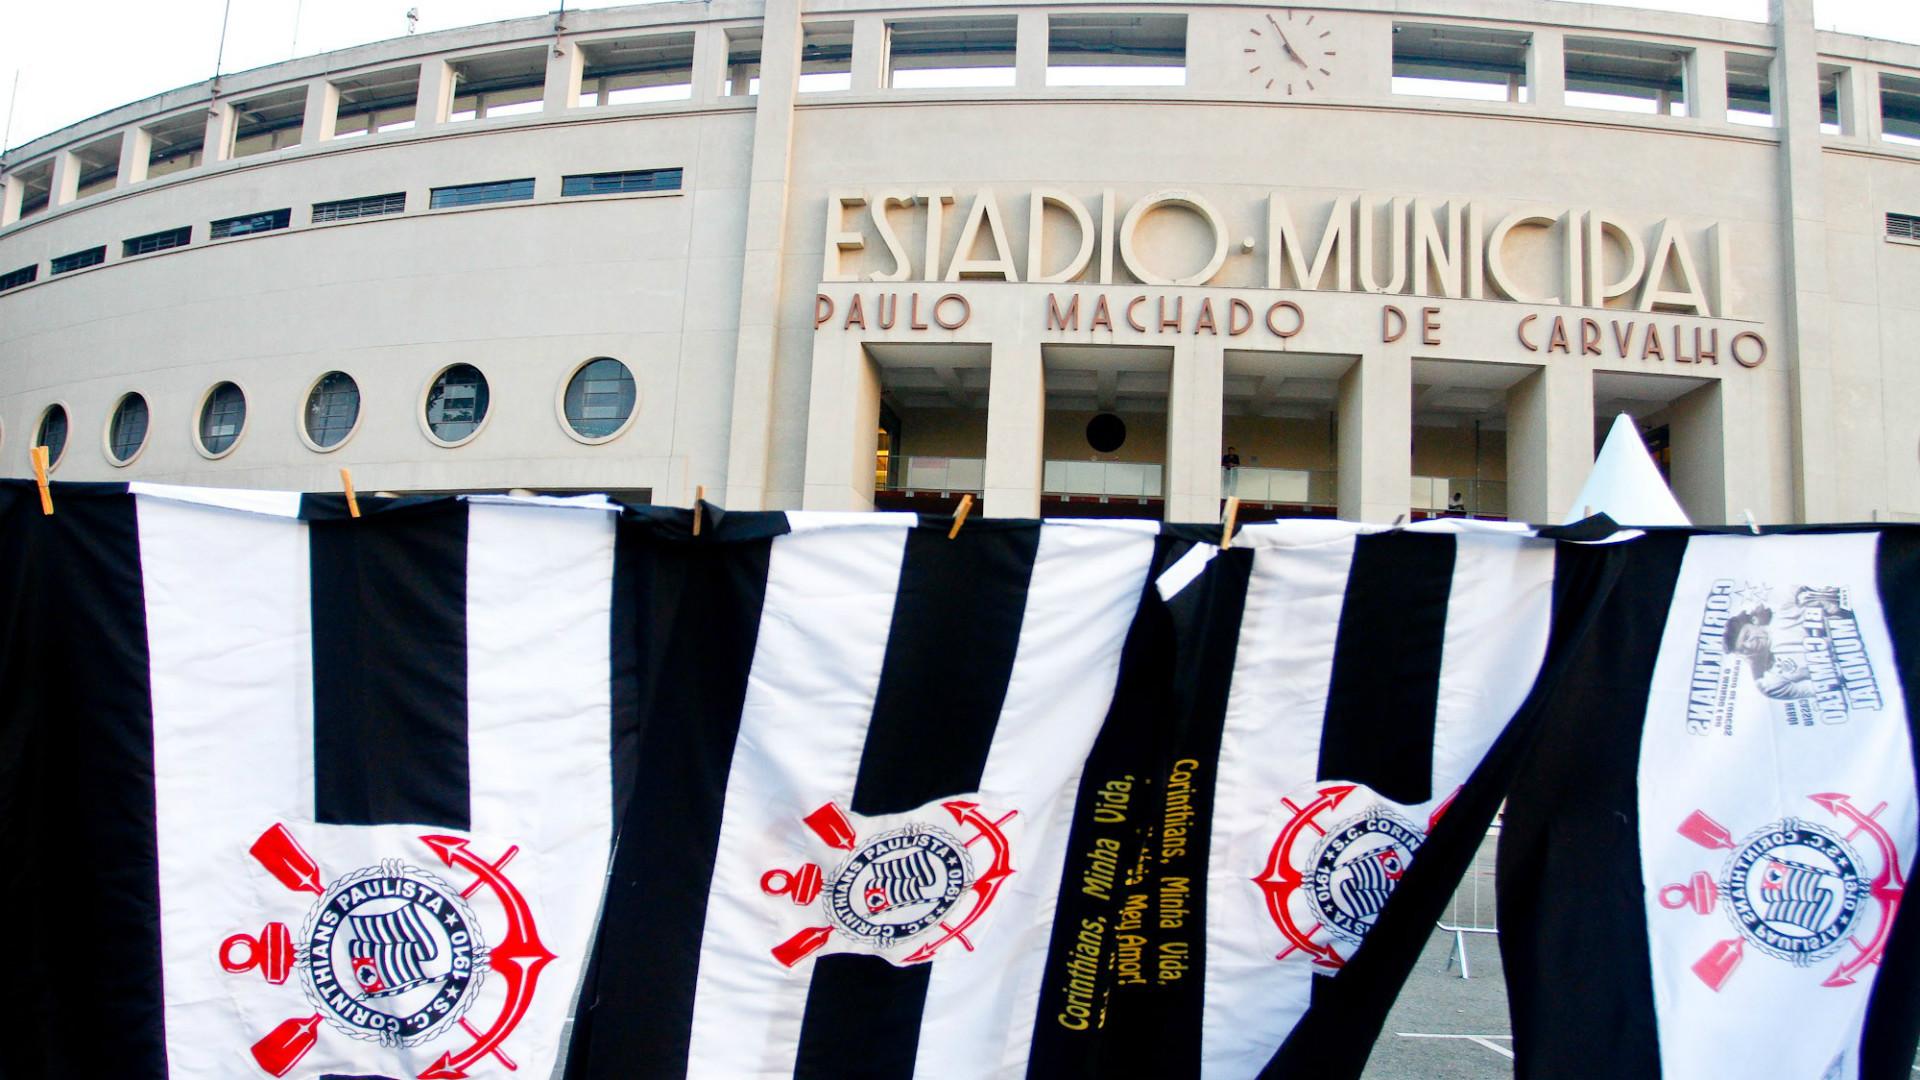 Corinthians - Pacaembu - 2014